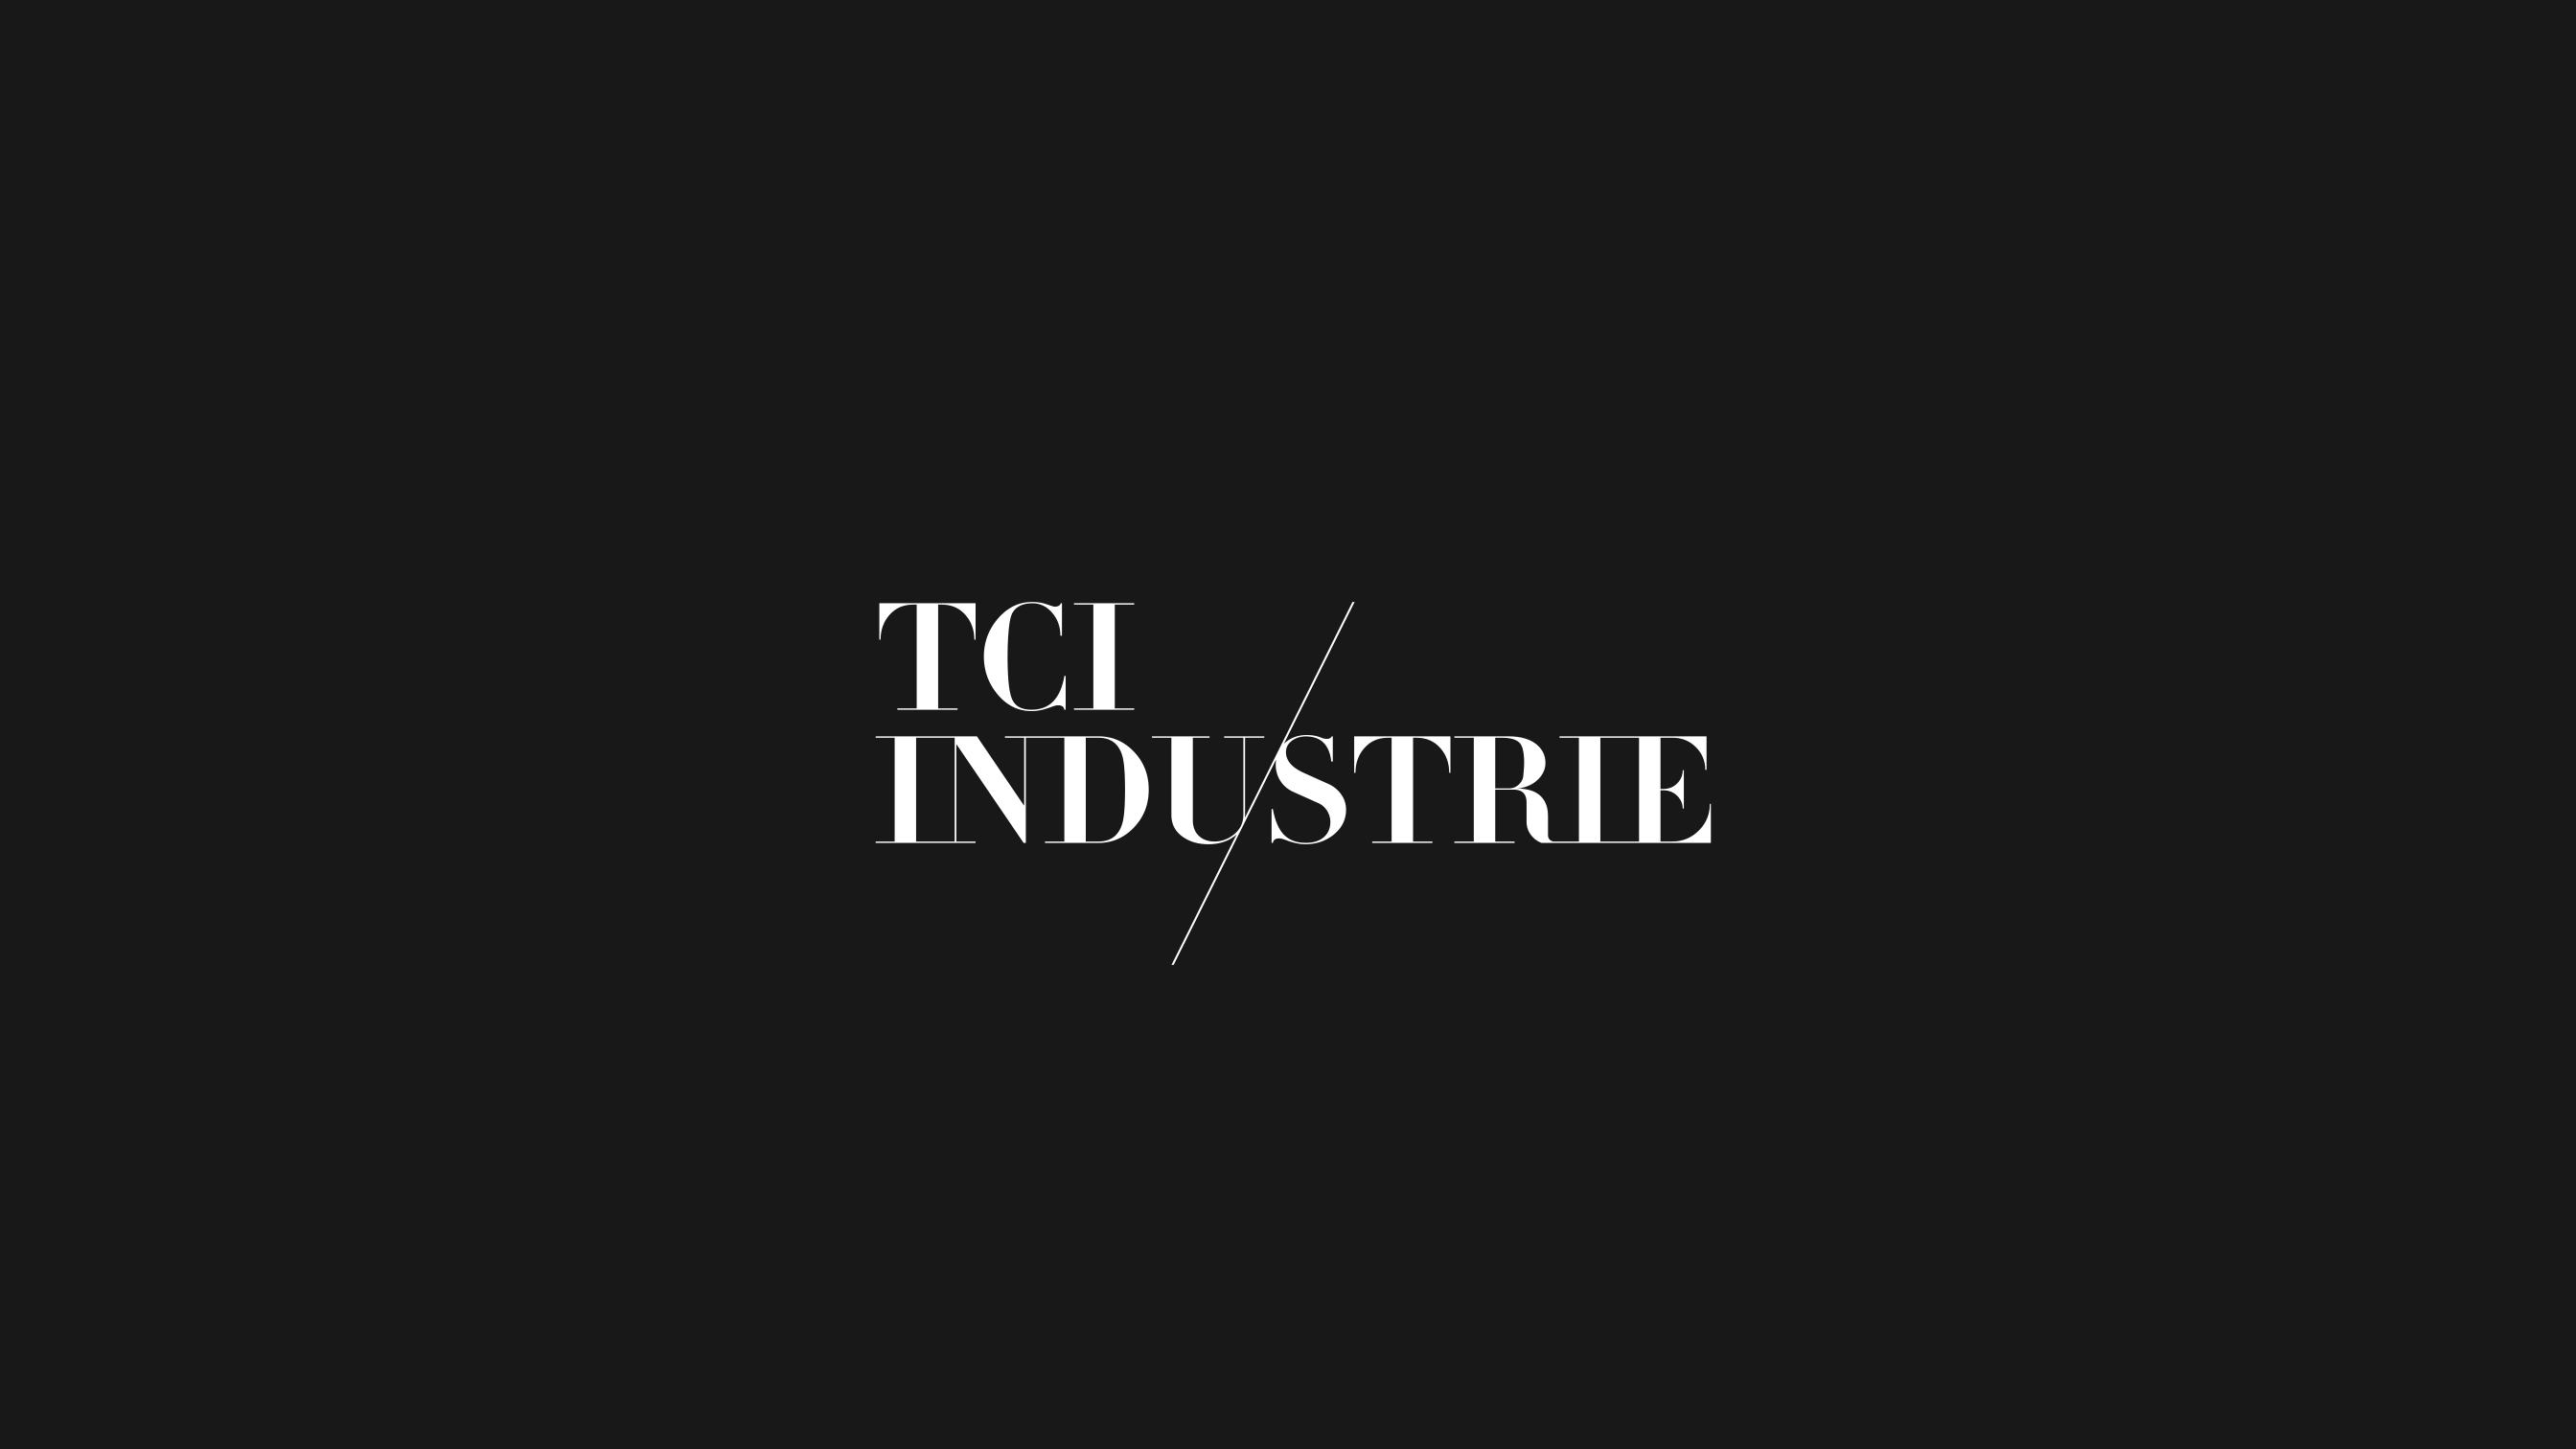 showcase-logotype-tci